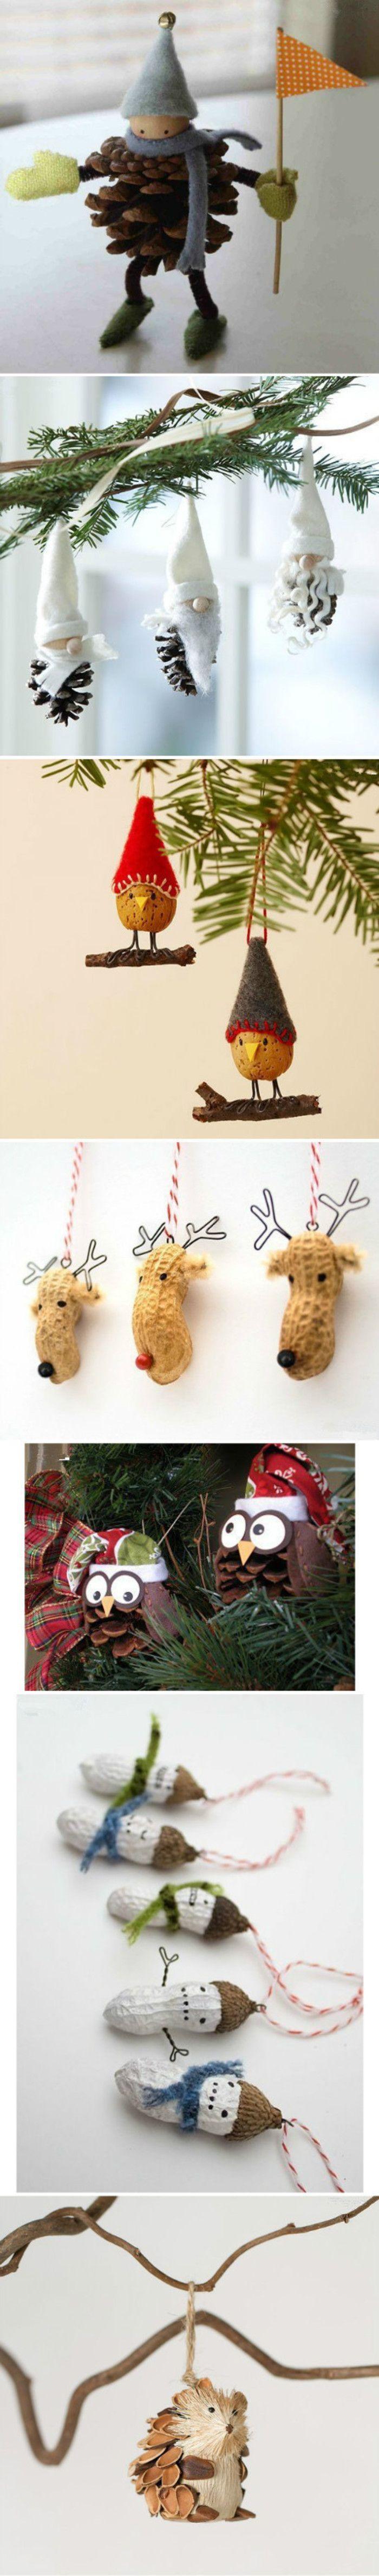 Nuts make Christmas trinkets